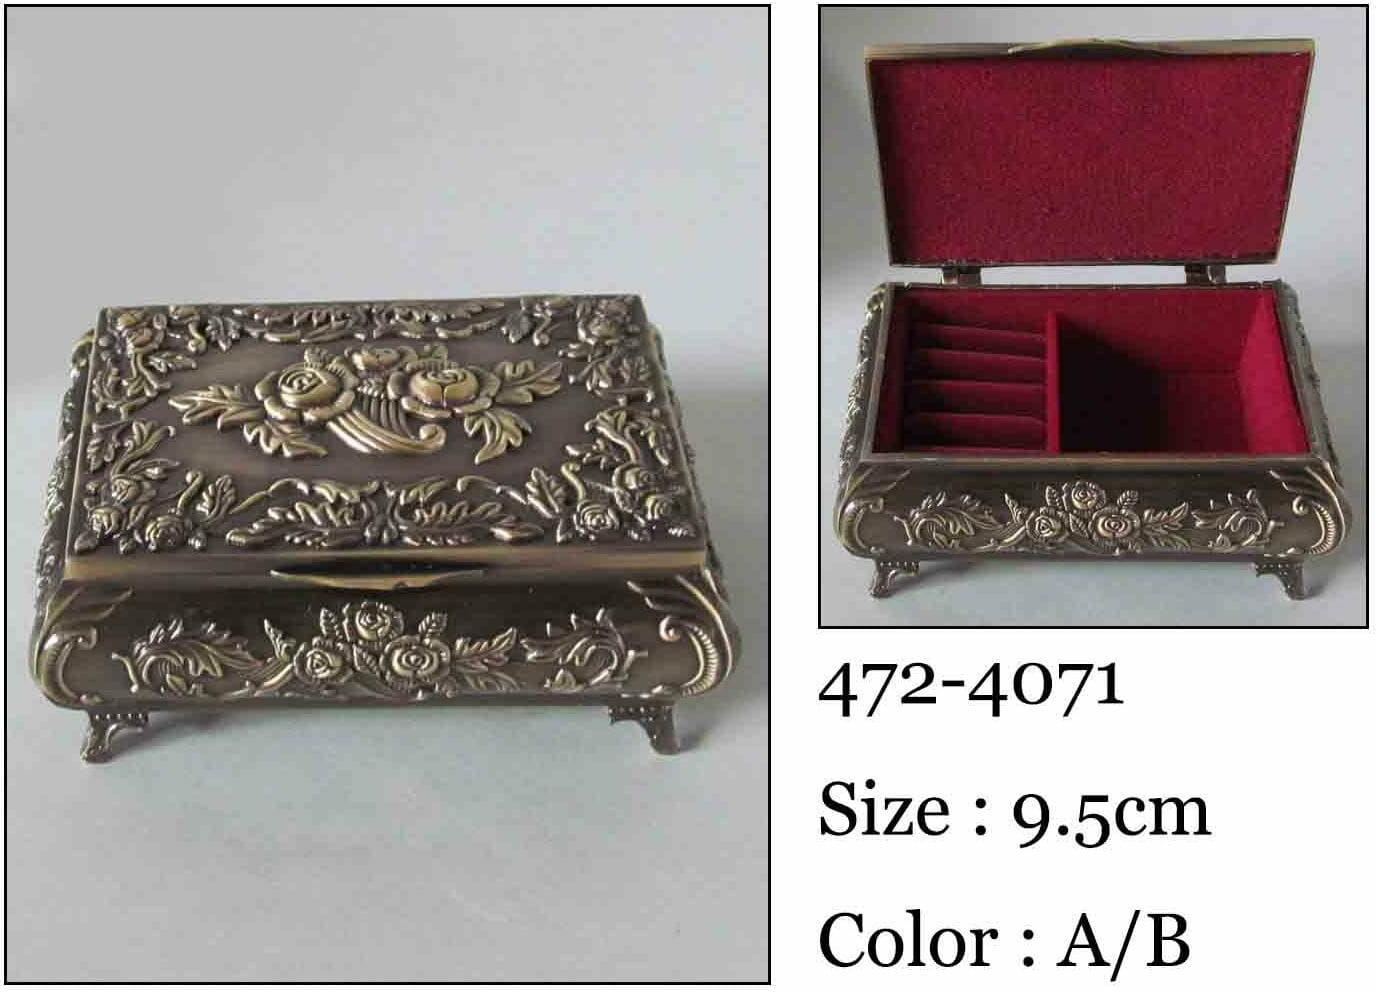 Kasetka, stare złoto 9x6,5 cm